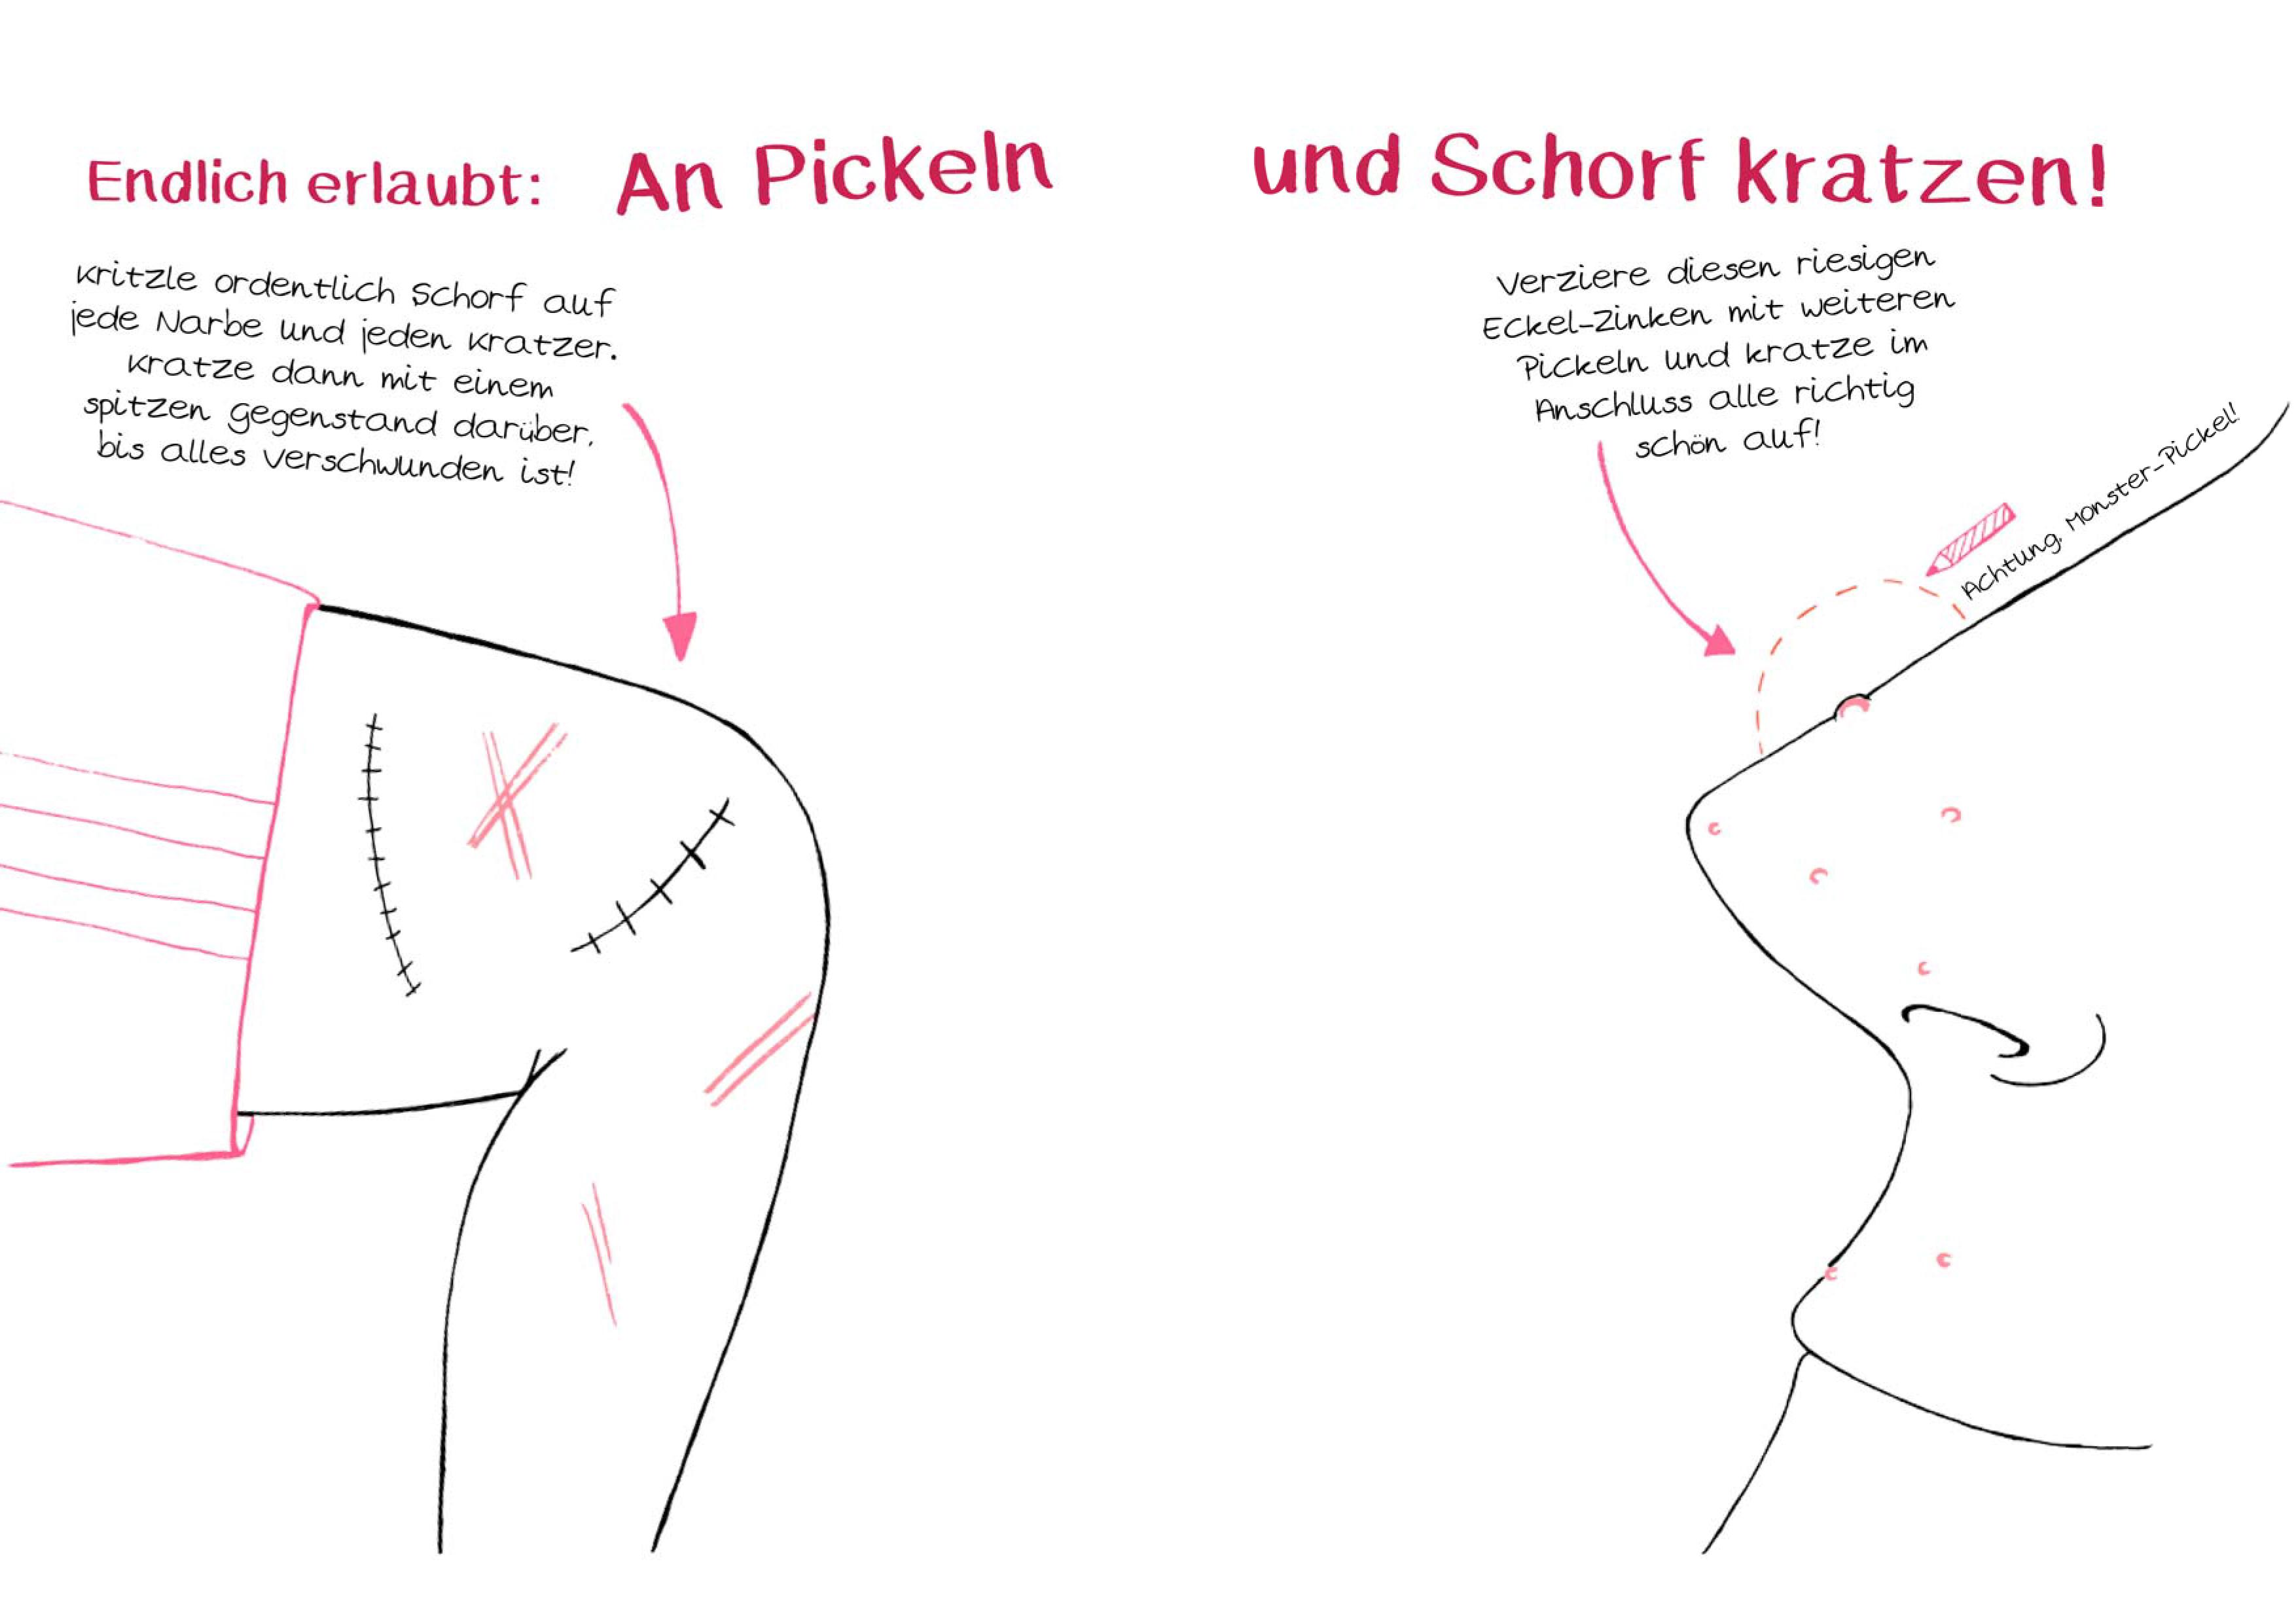 pattloch_kritzelnmaedchen_01.jpg